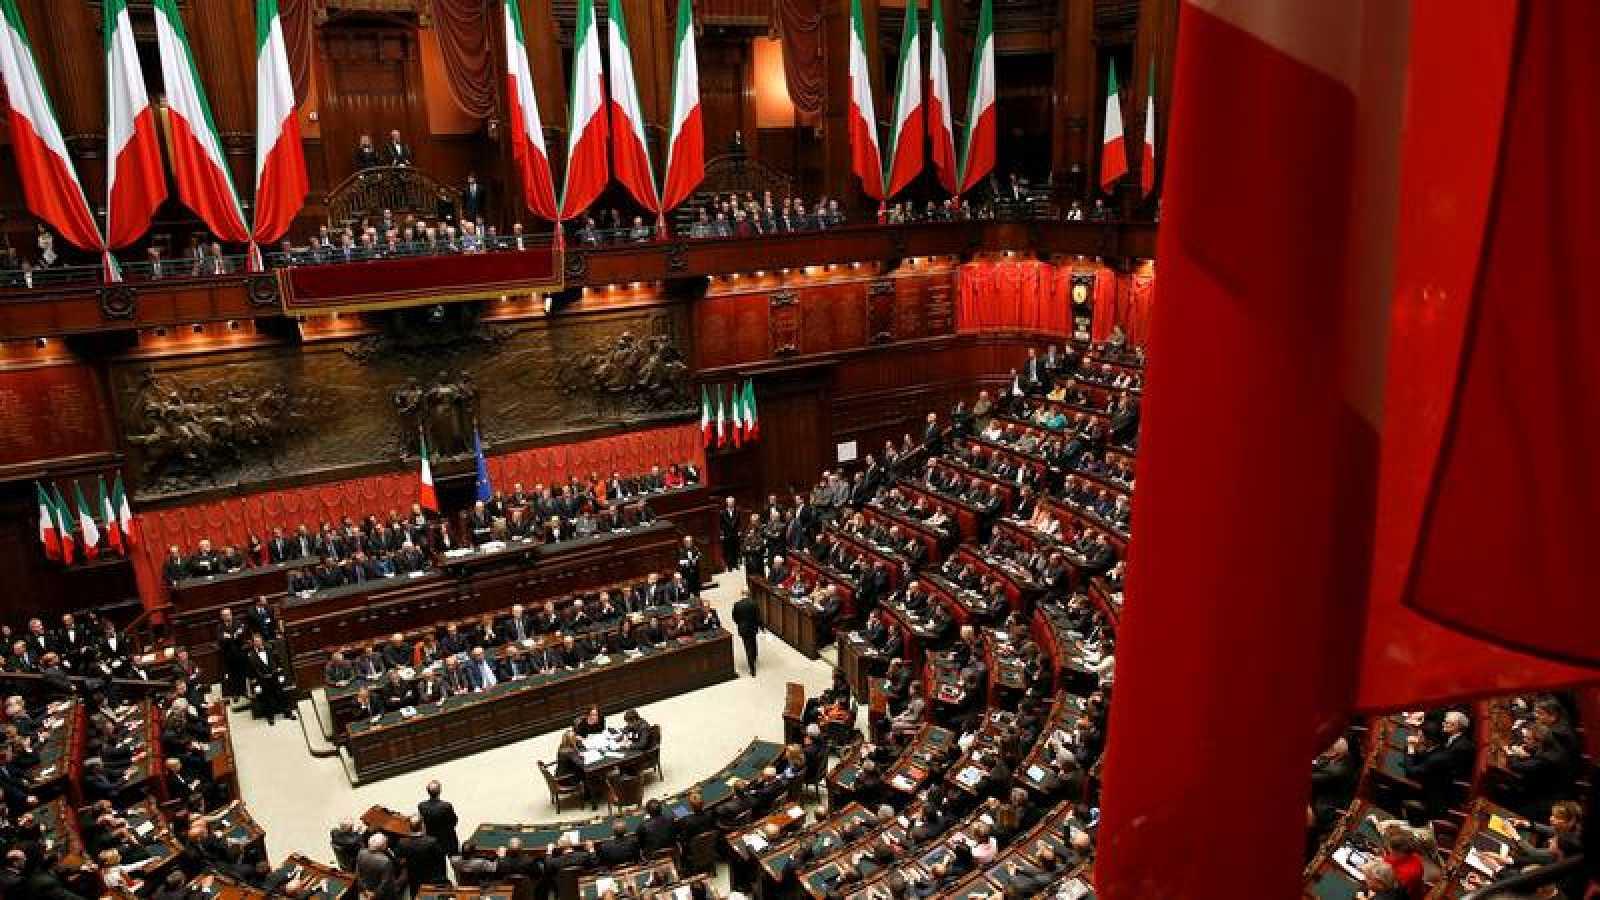 Una vista general del Parlamento italiano